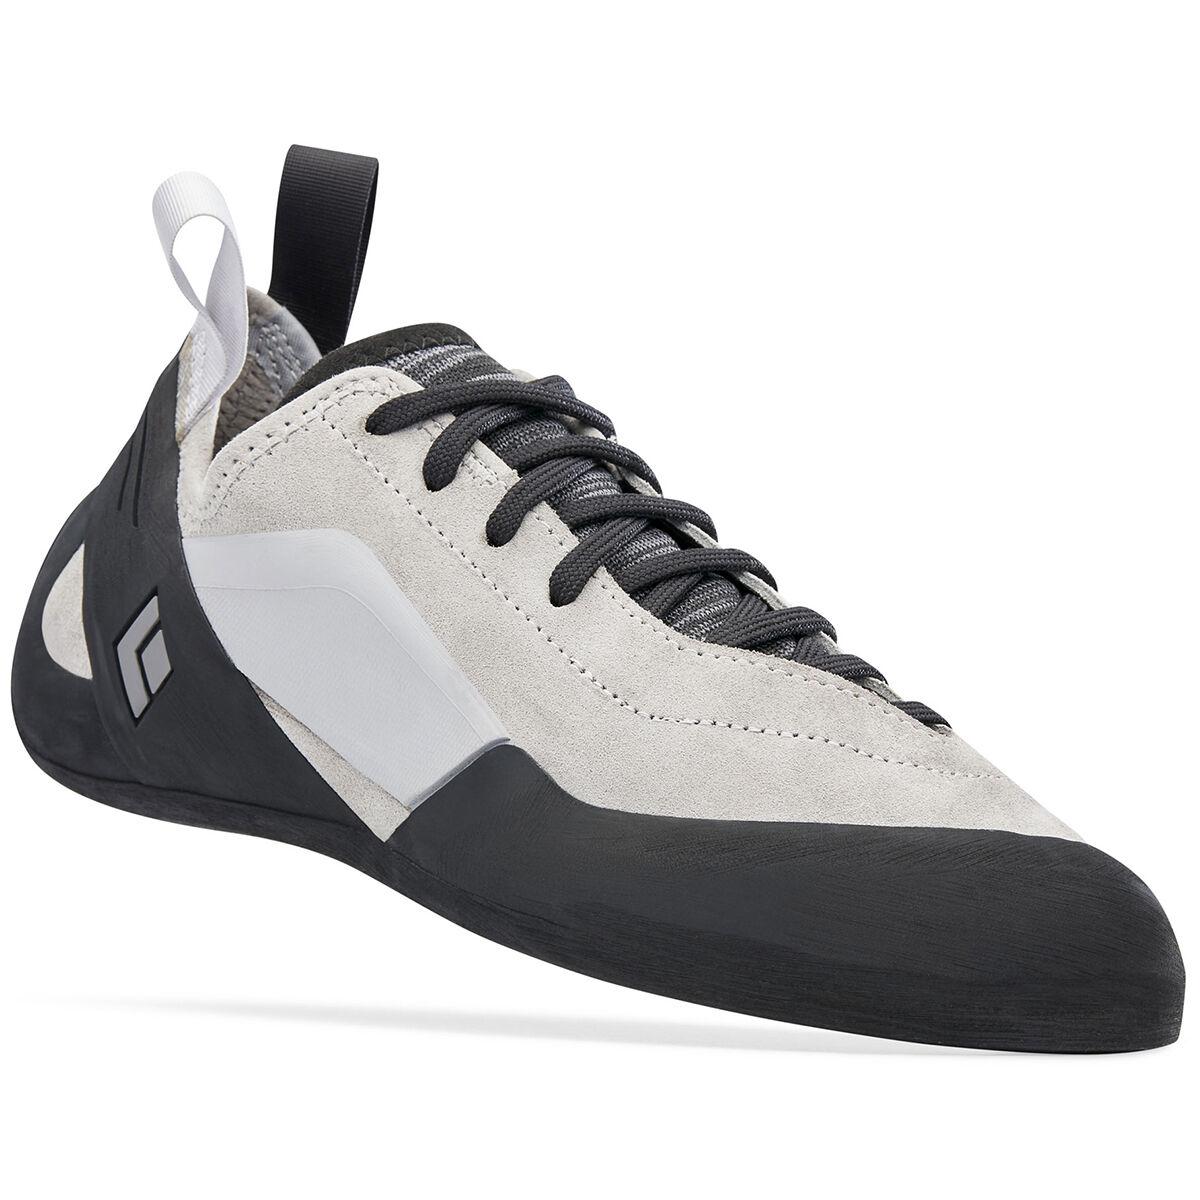 Black Diamond Men's Aspect Climbing Shoes - Size 5.5